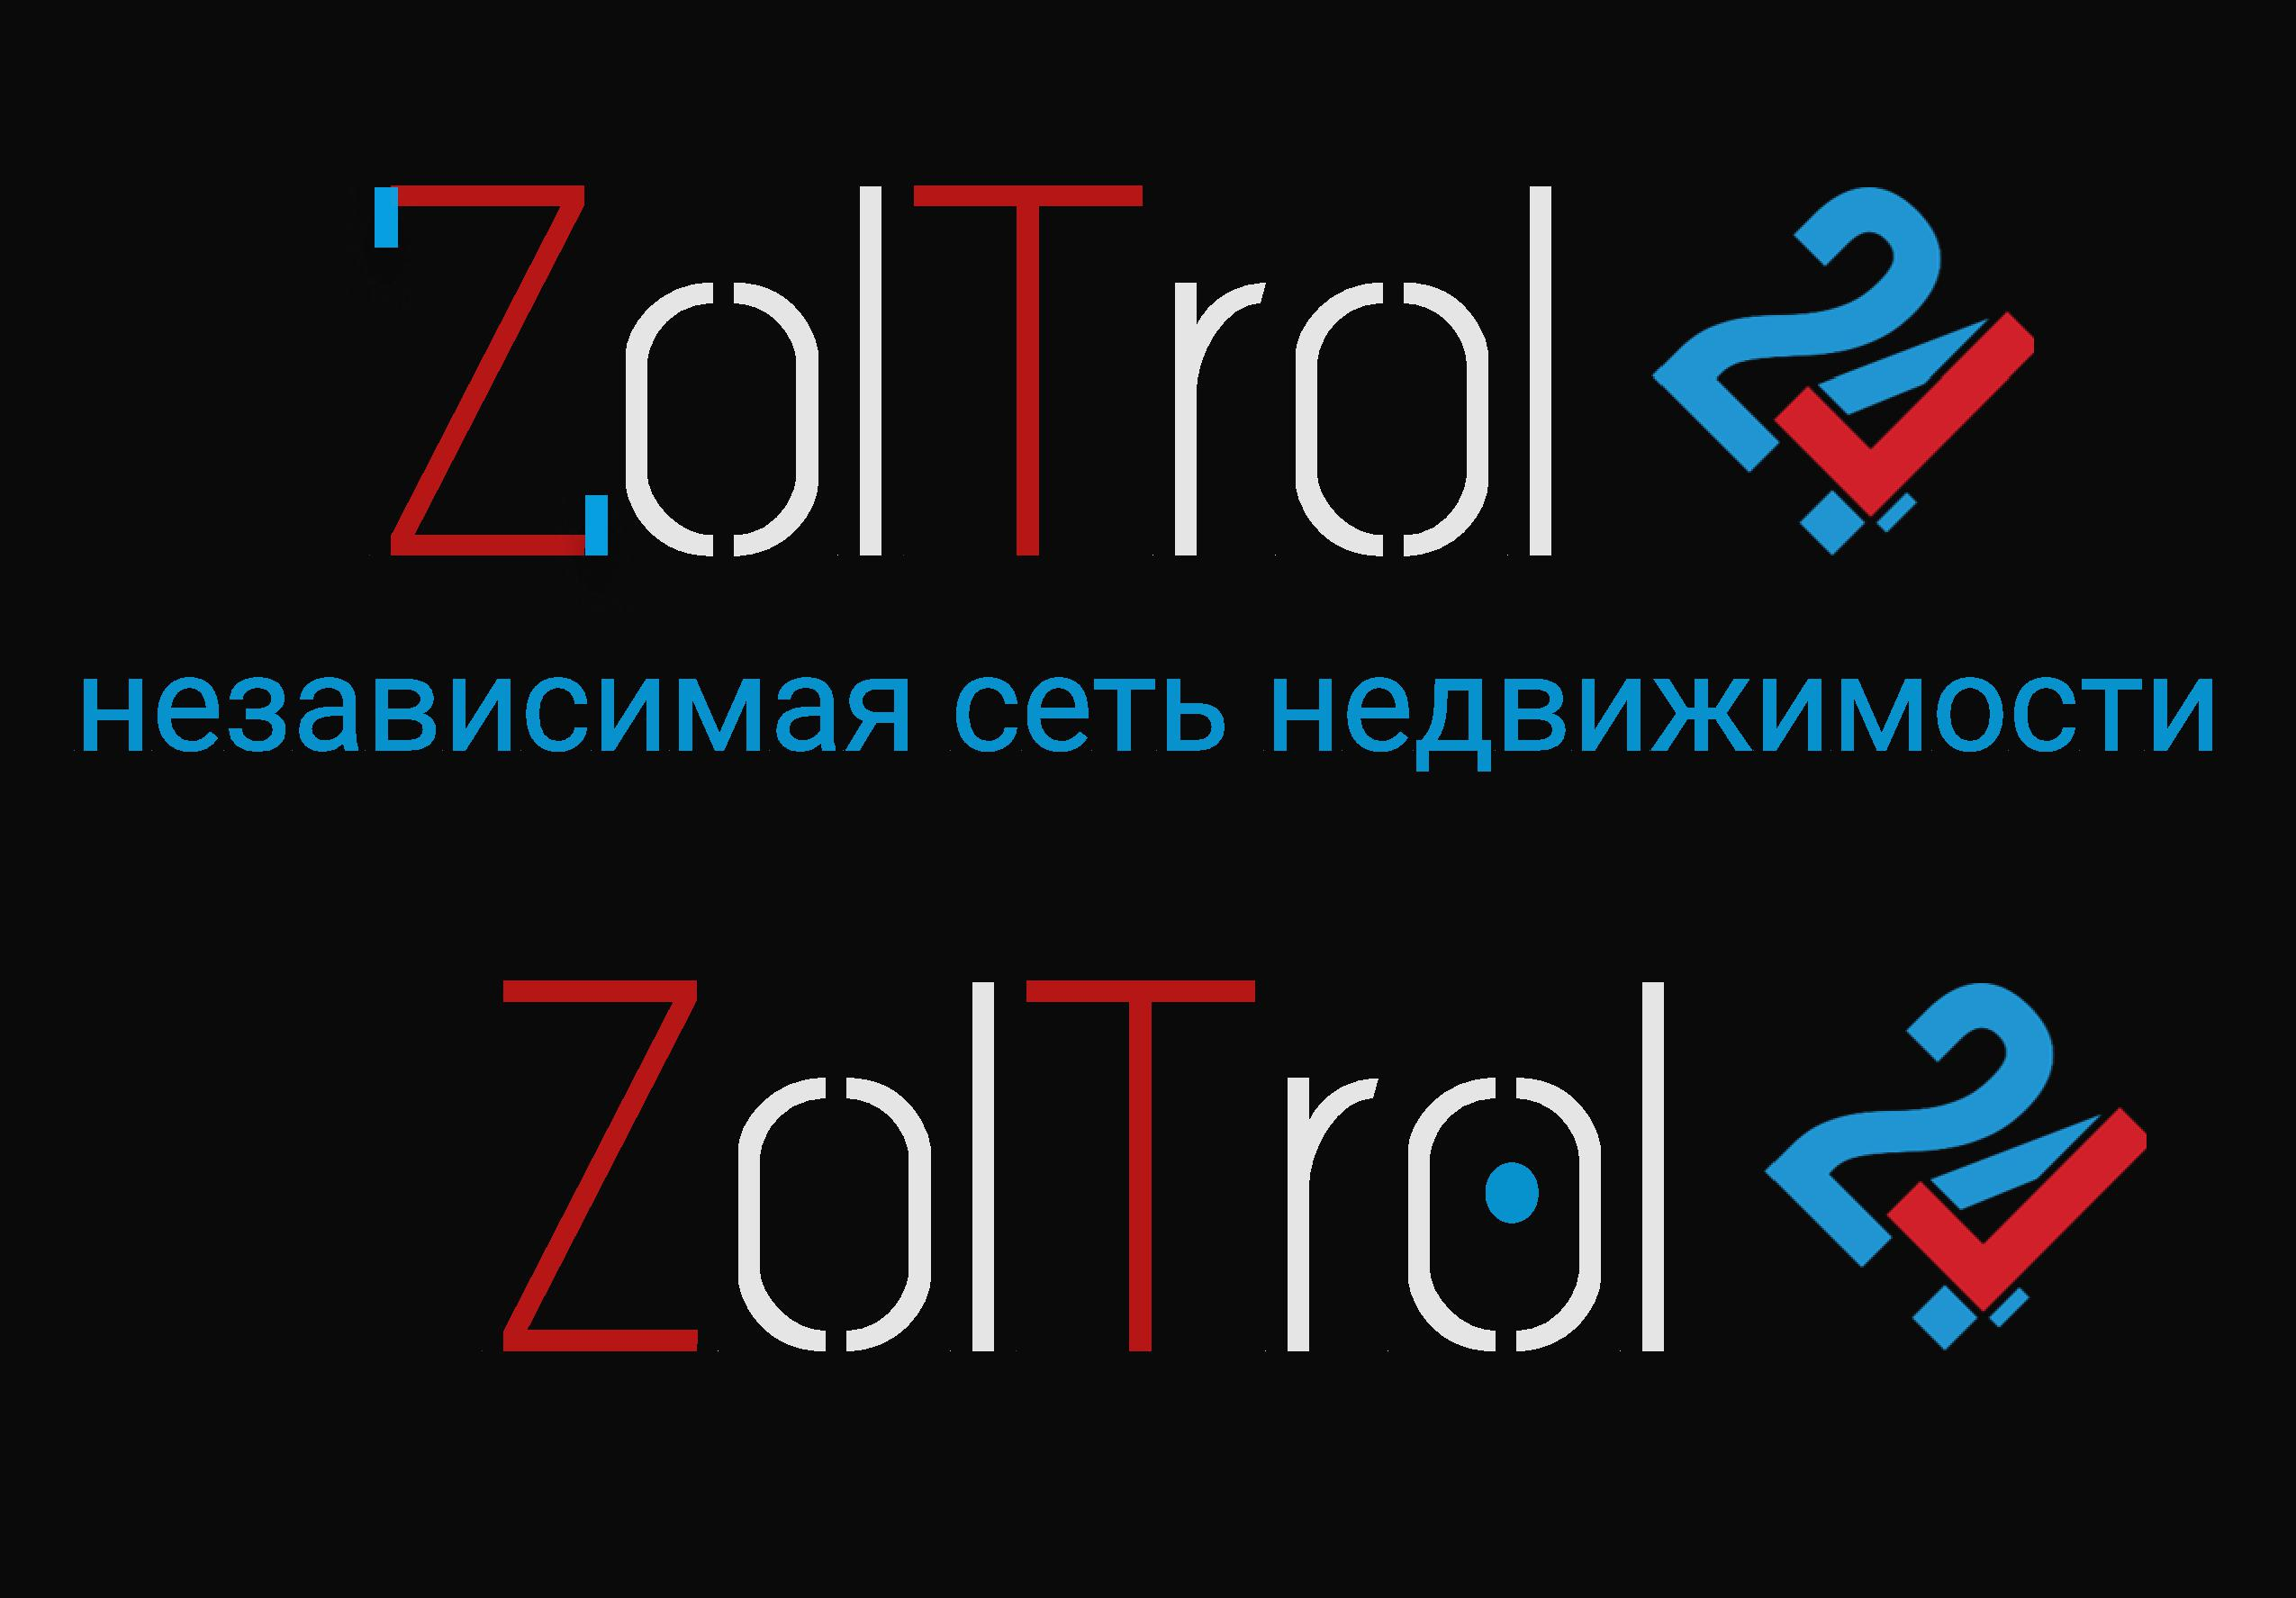 Логотип и фирменный стиль ZolTor24 фото f_4655c87aedd73603.jpg